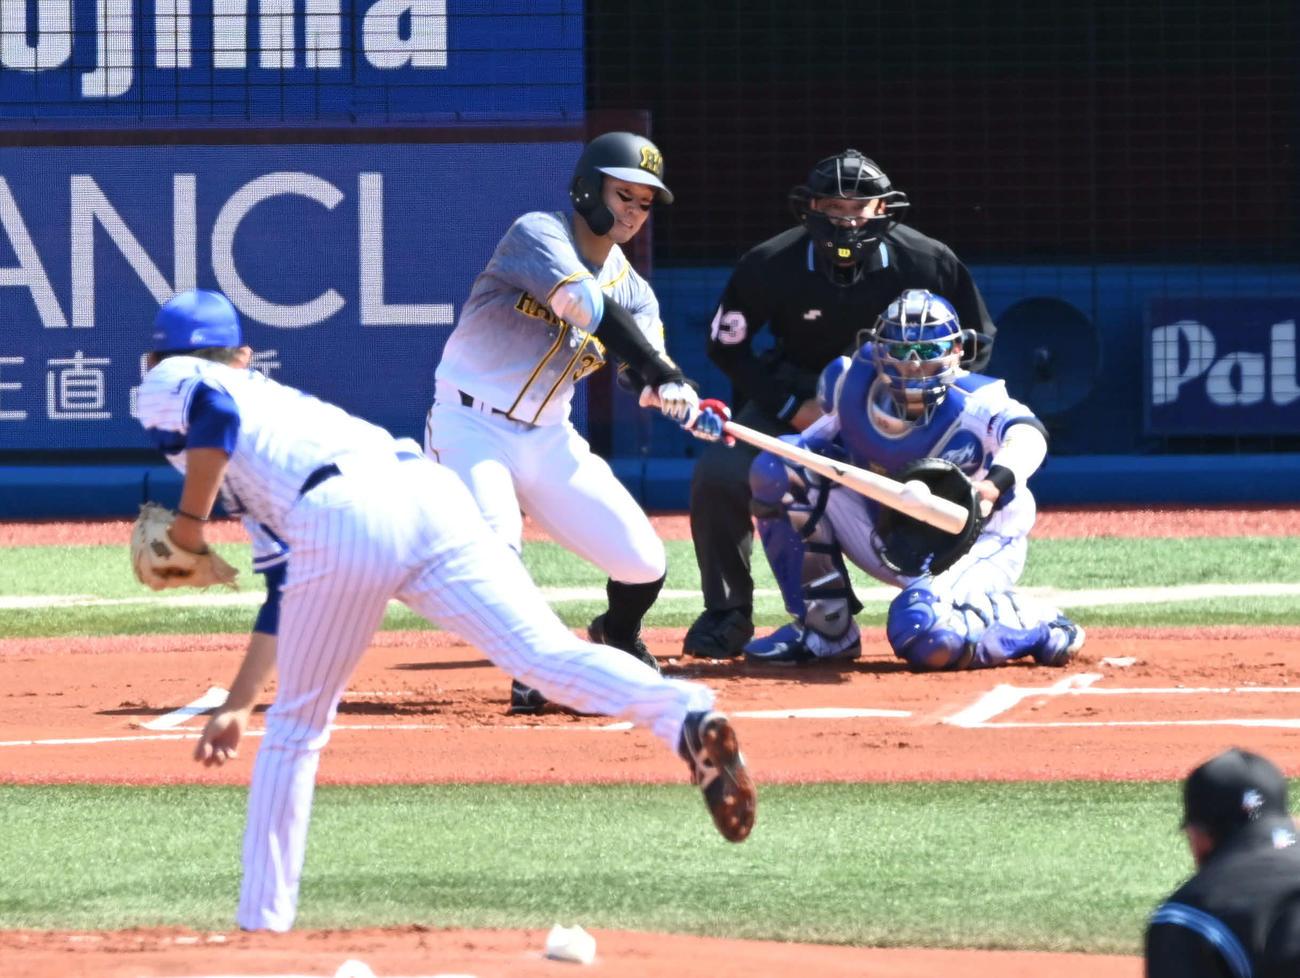 DeNA対阪神 1回表阪神無死一塁、糸原は右前打を放つ。投手は阪口(撮影・山崎安昭)